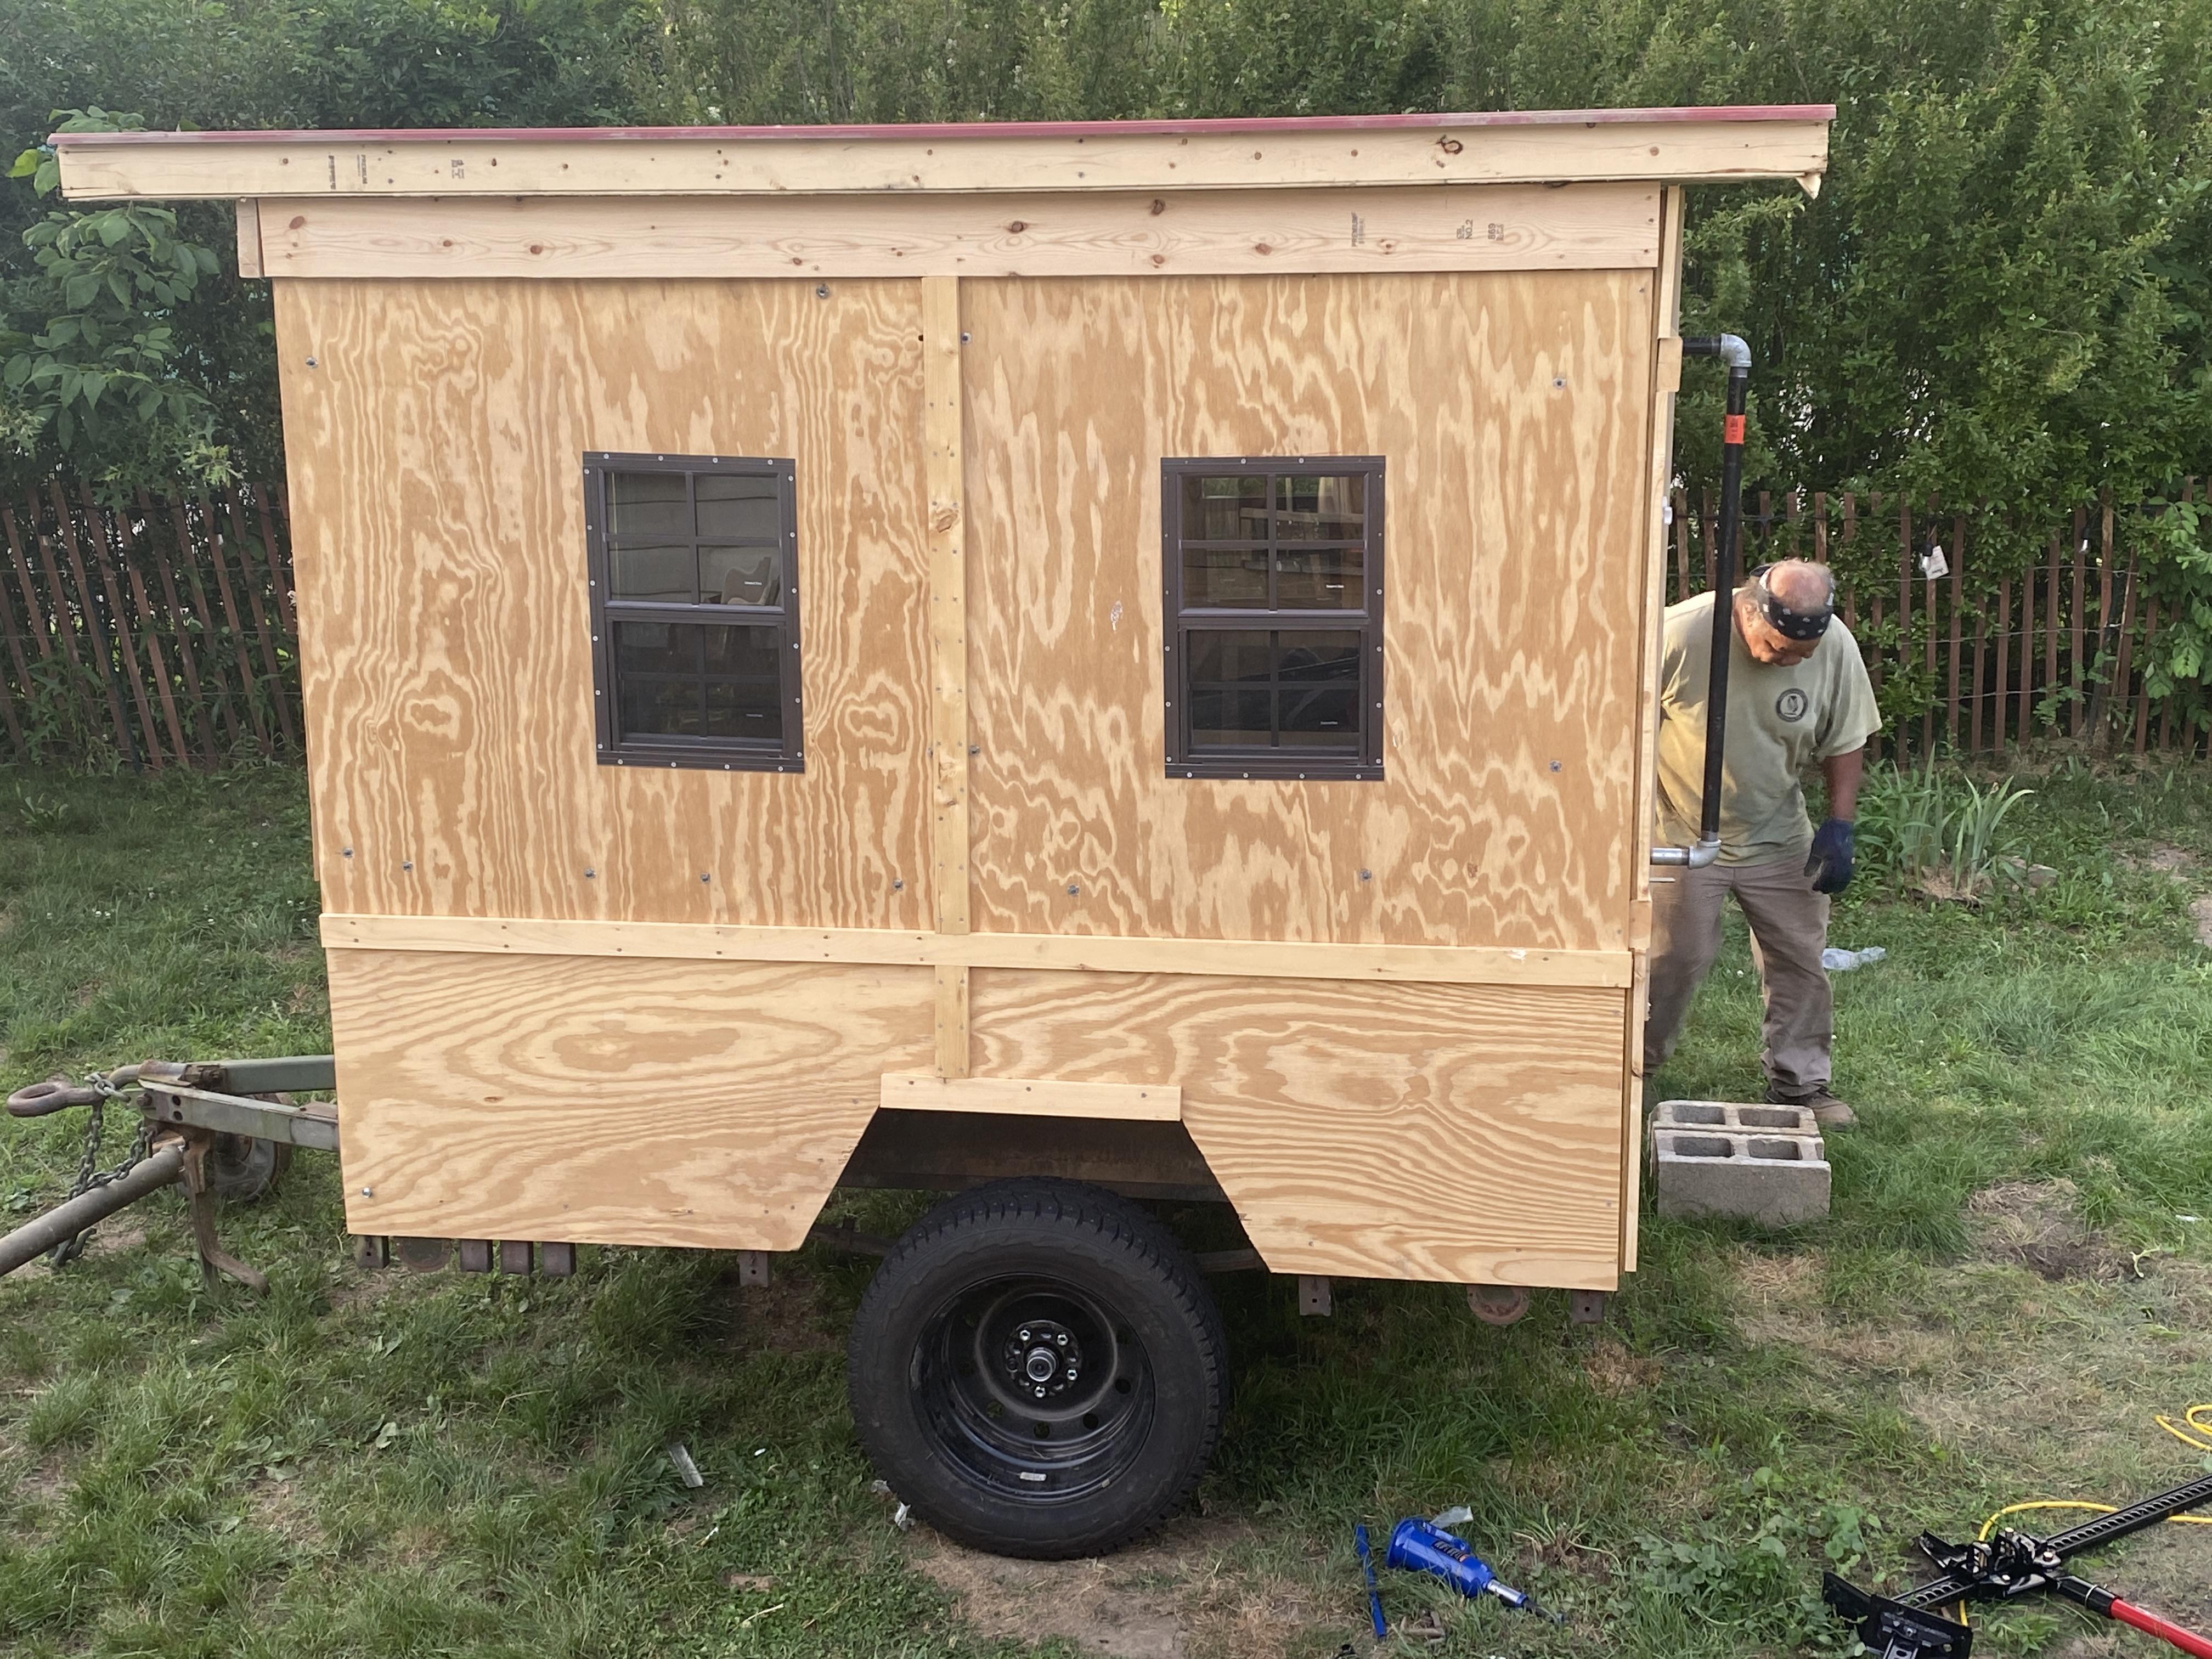 Diy overland camper on military trailer-4302f1c1-3686-4ed4-bd52-0ad5422e25bb_1593351267790.jpeg